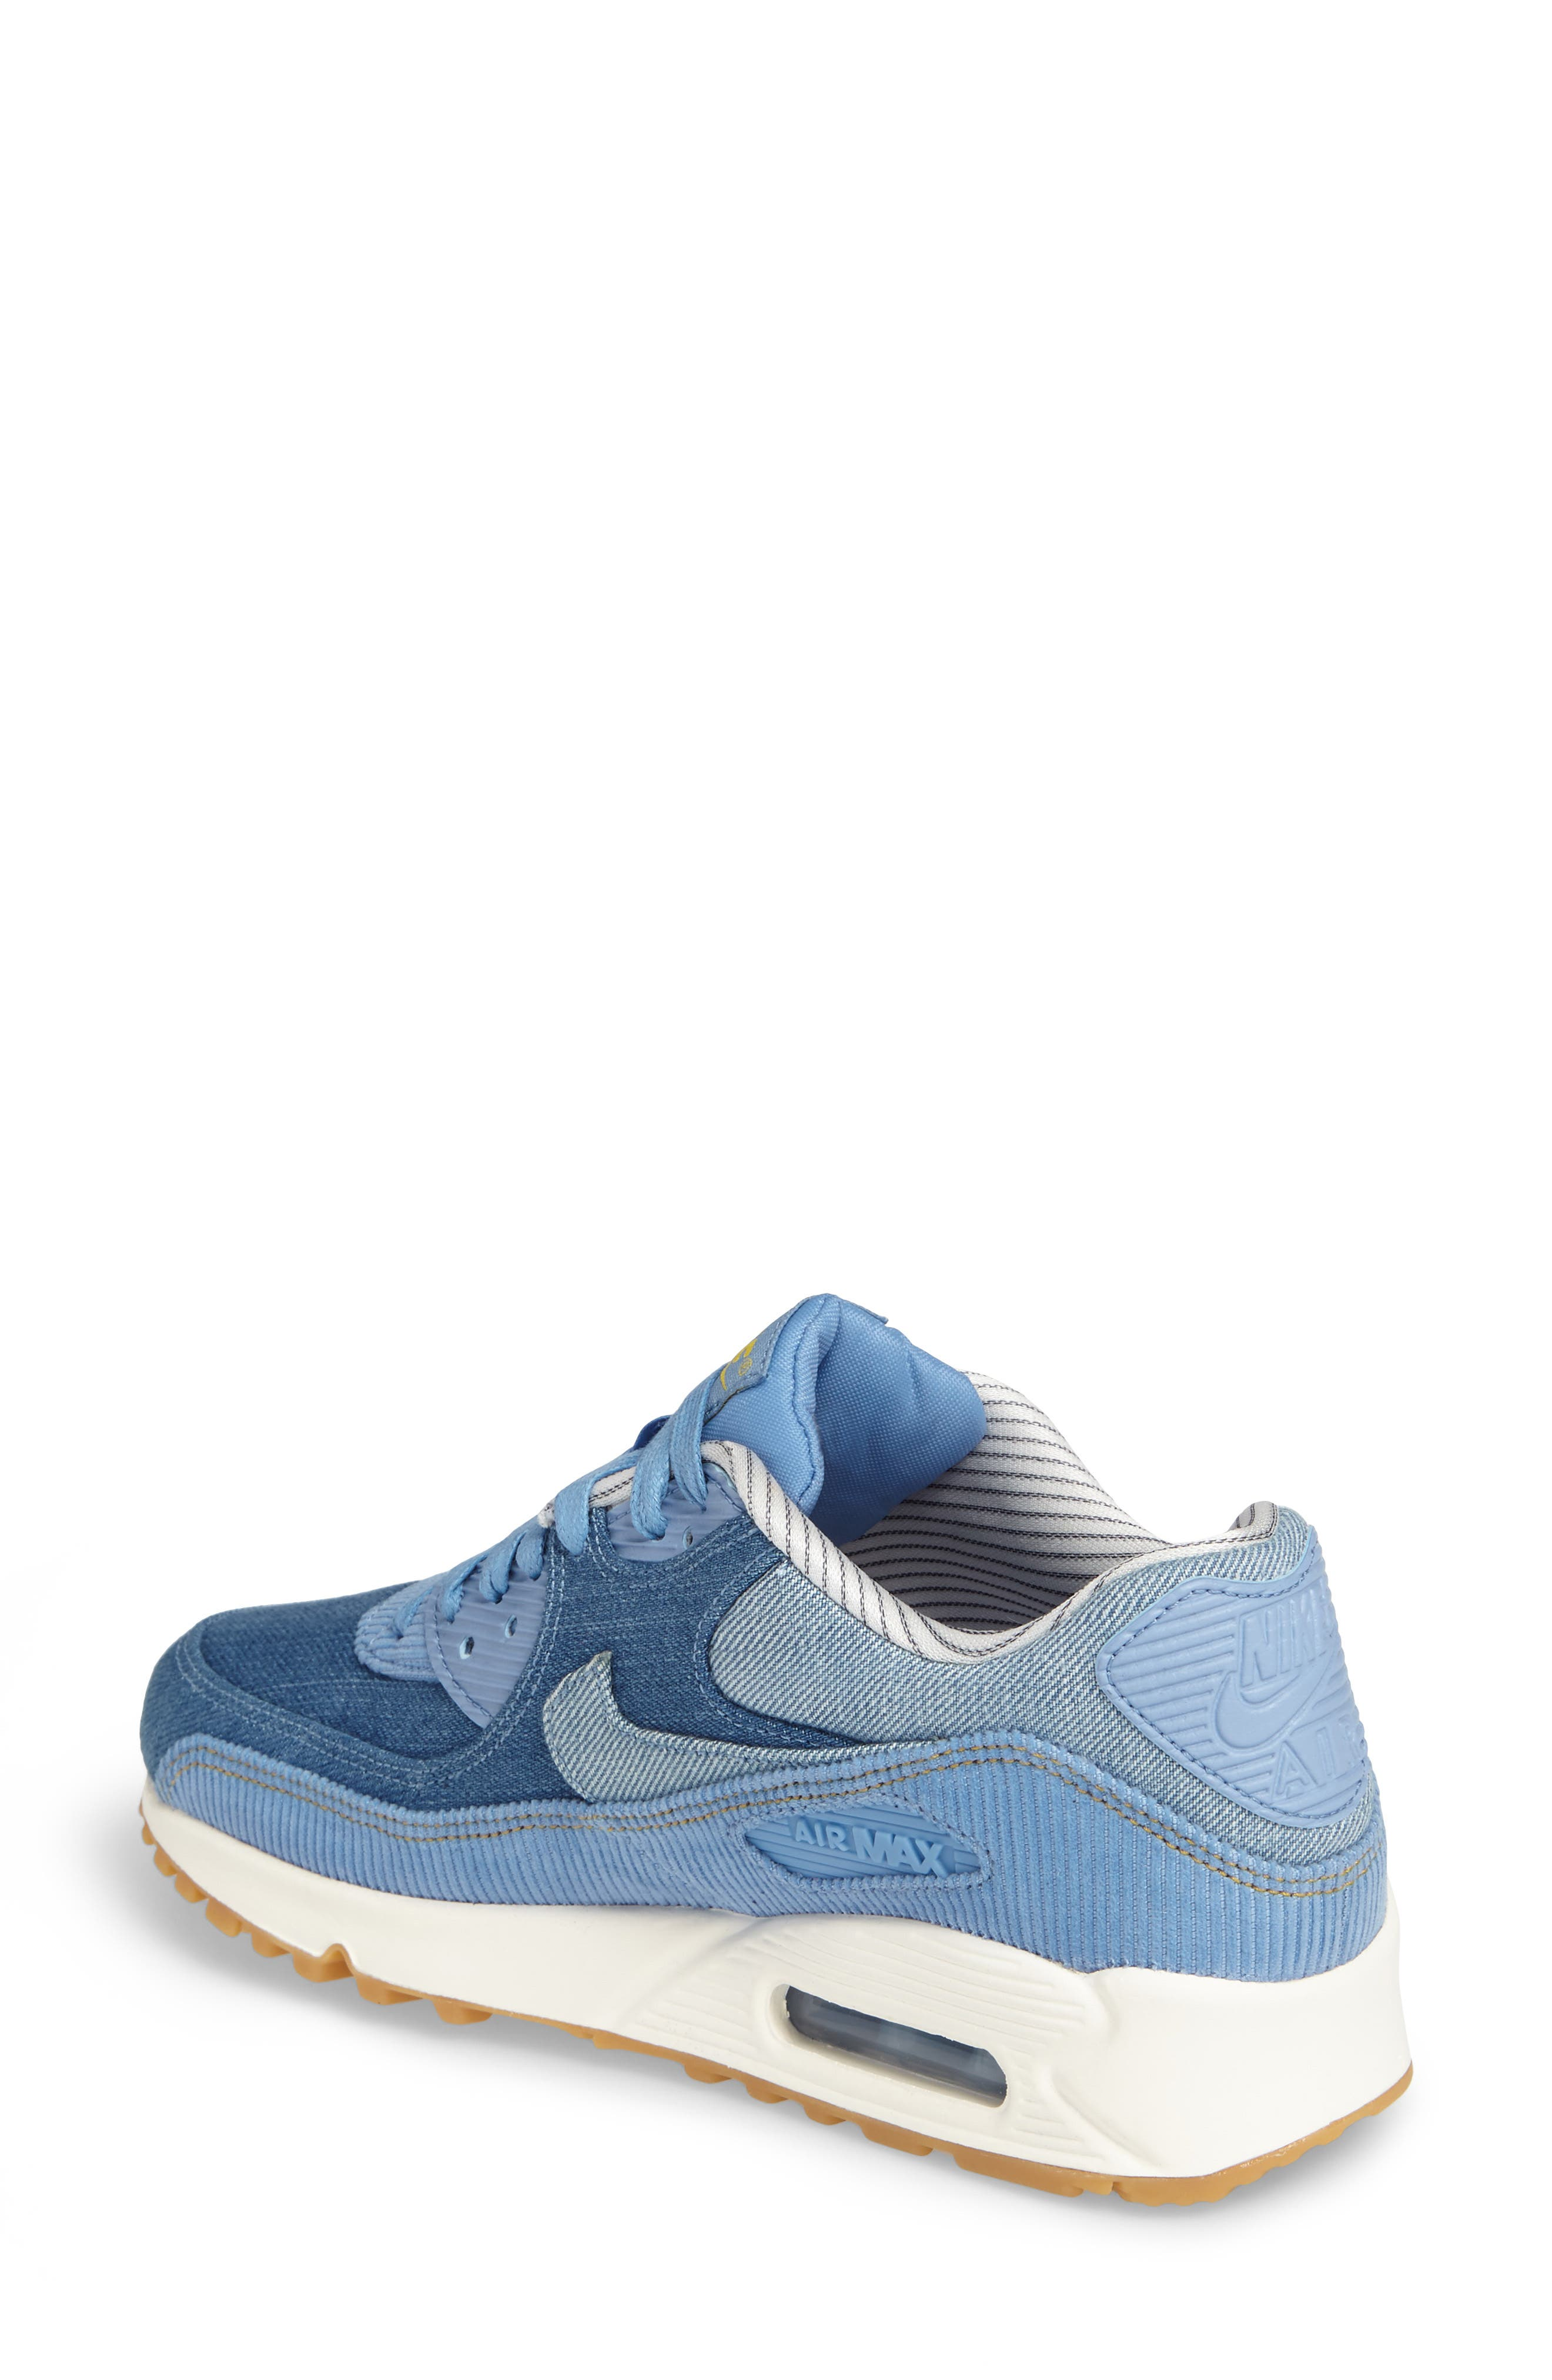 Air Max 90 SE Sneaker,                             Alternate thumbnail 17, color,